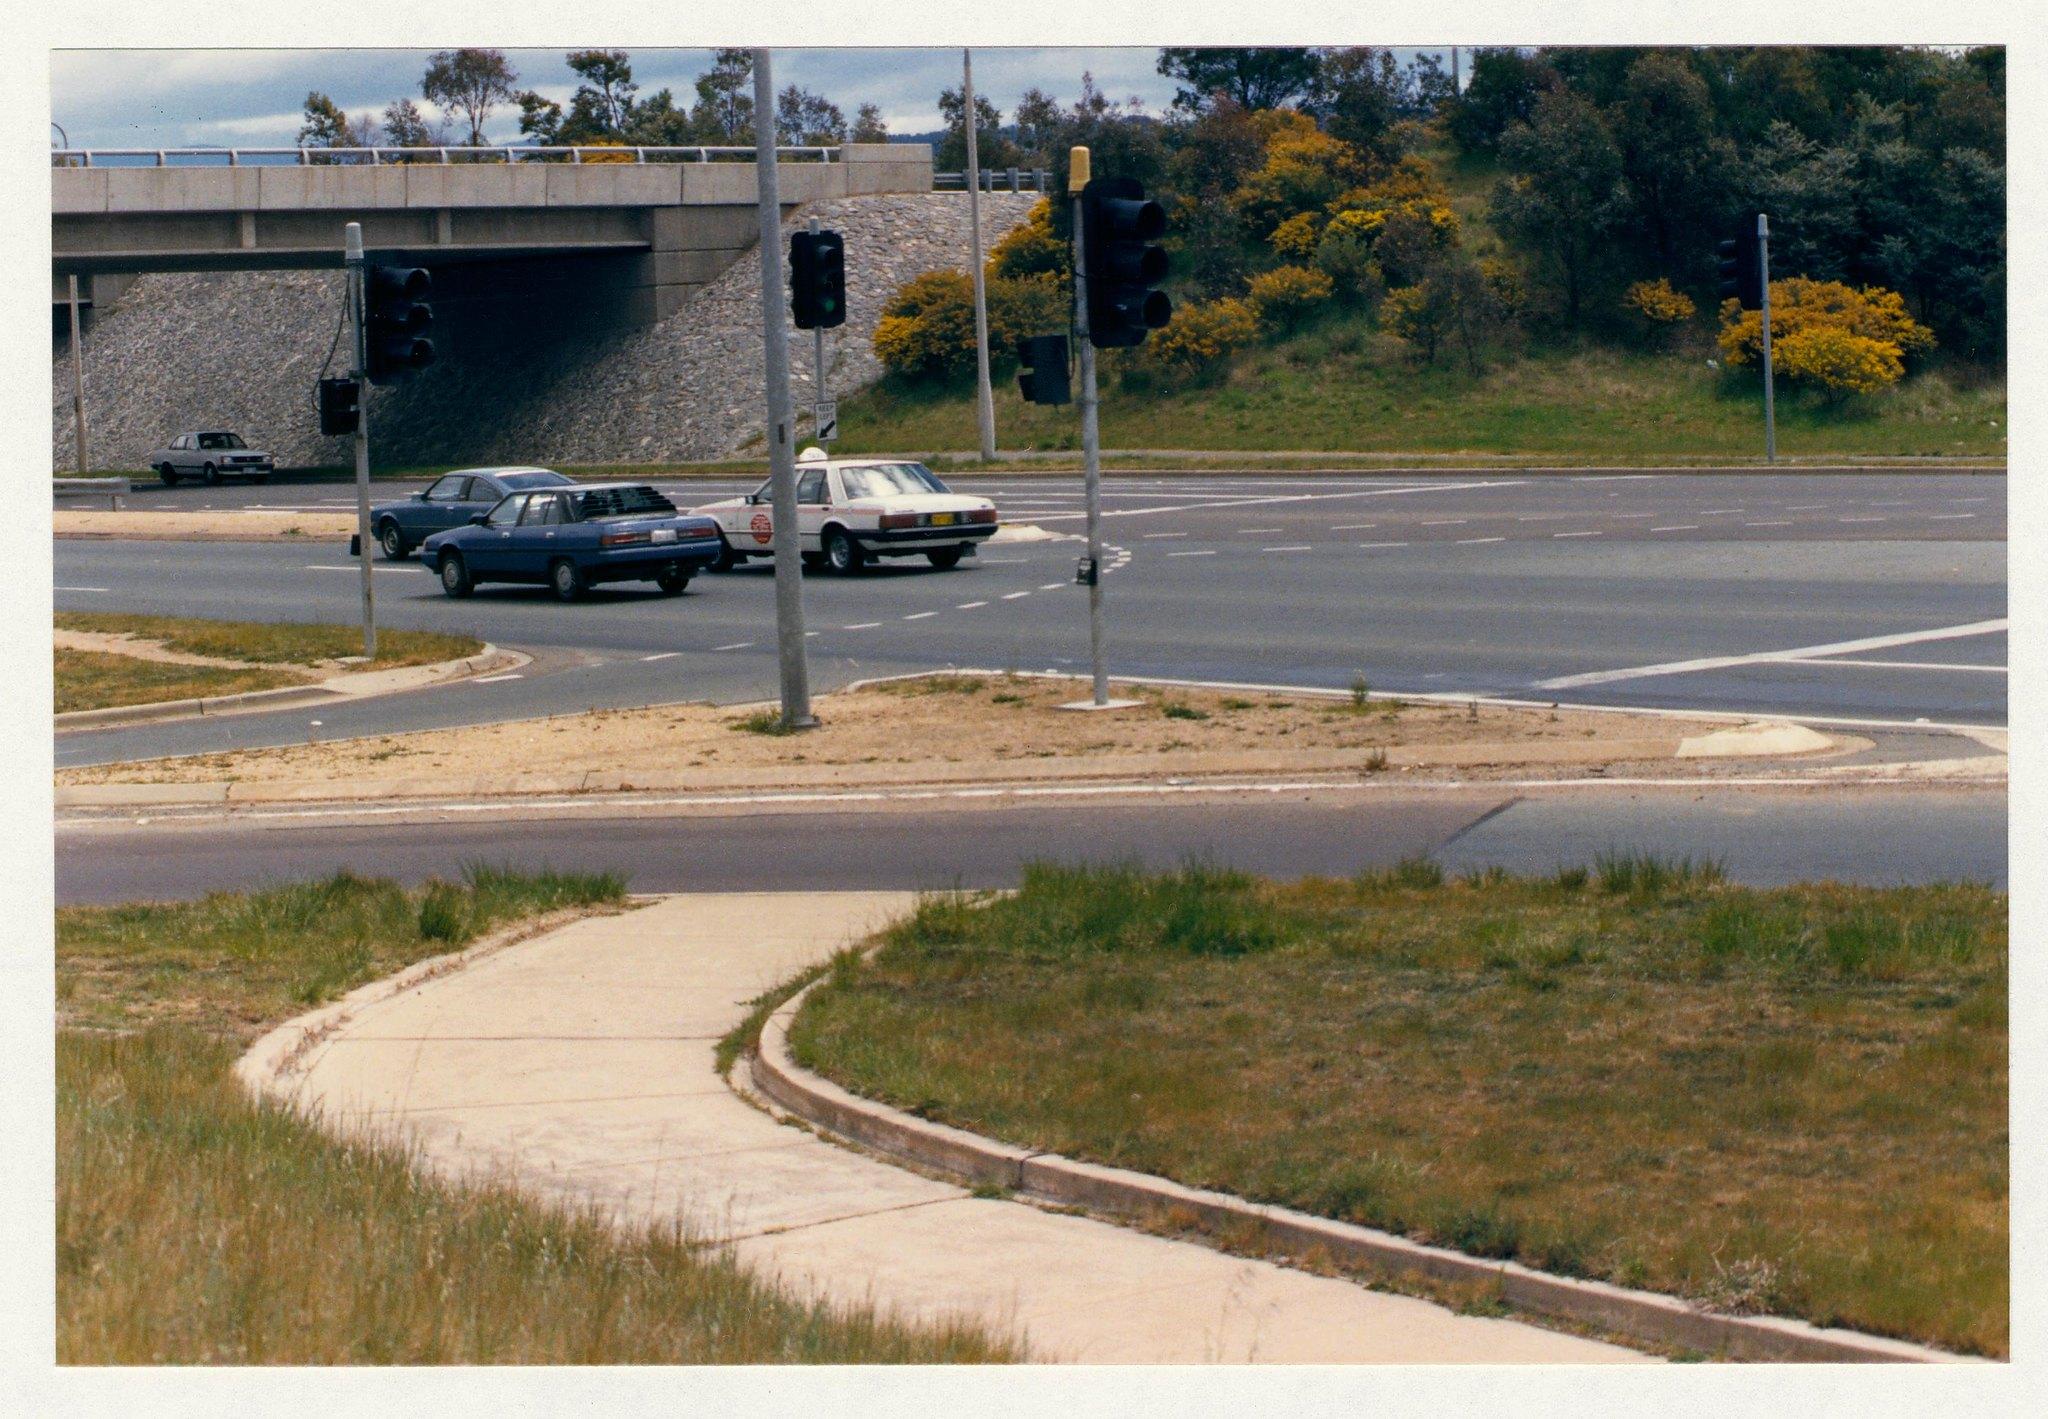 Hindmarsh DriveTuggeranong Parkway intersection. Pathway leading to nowhere!! c1989